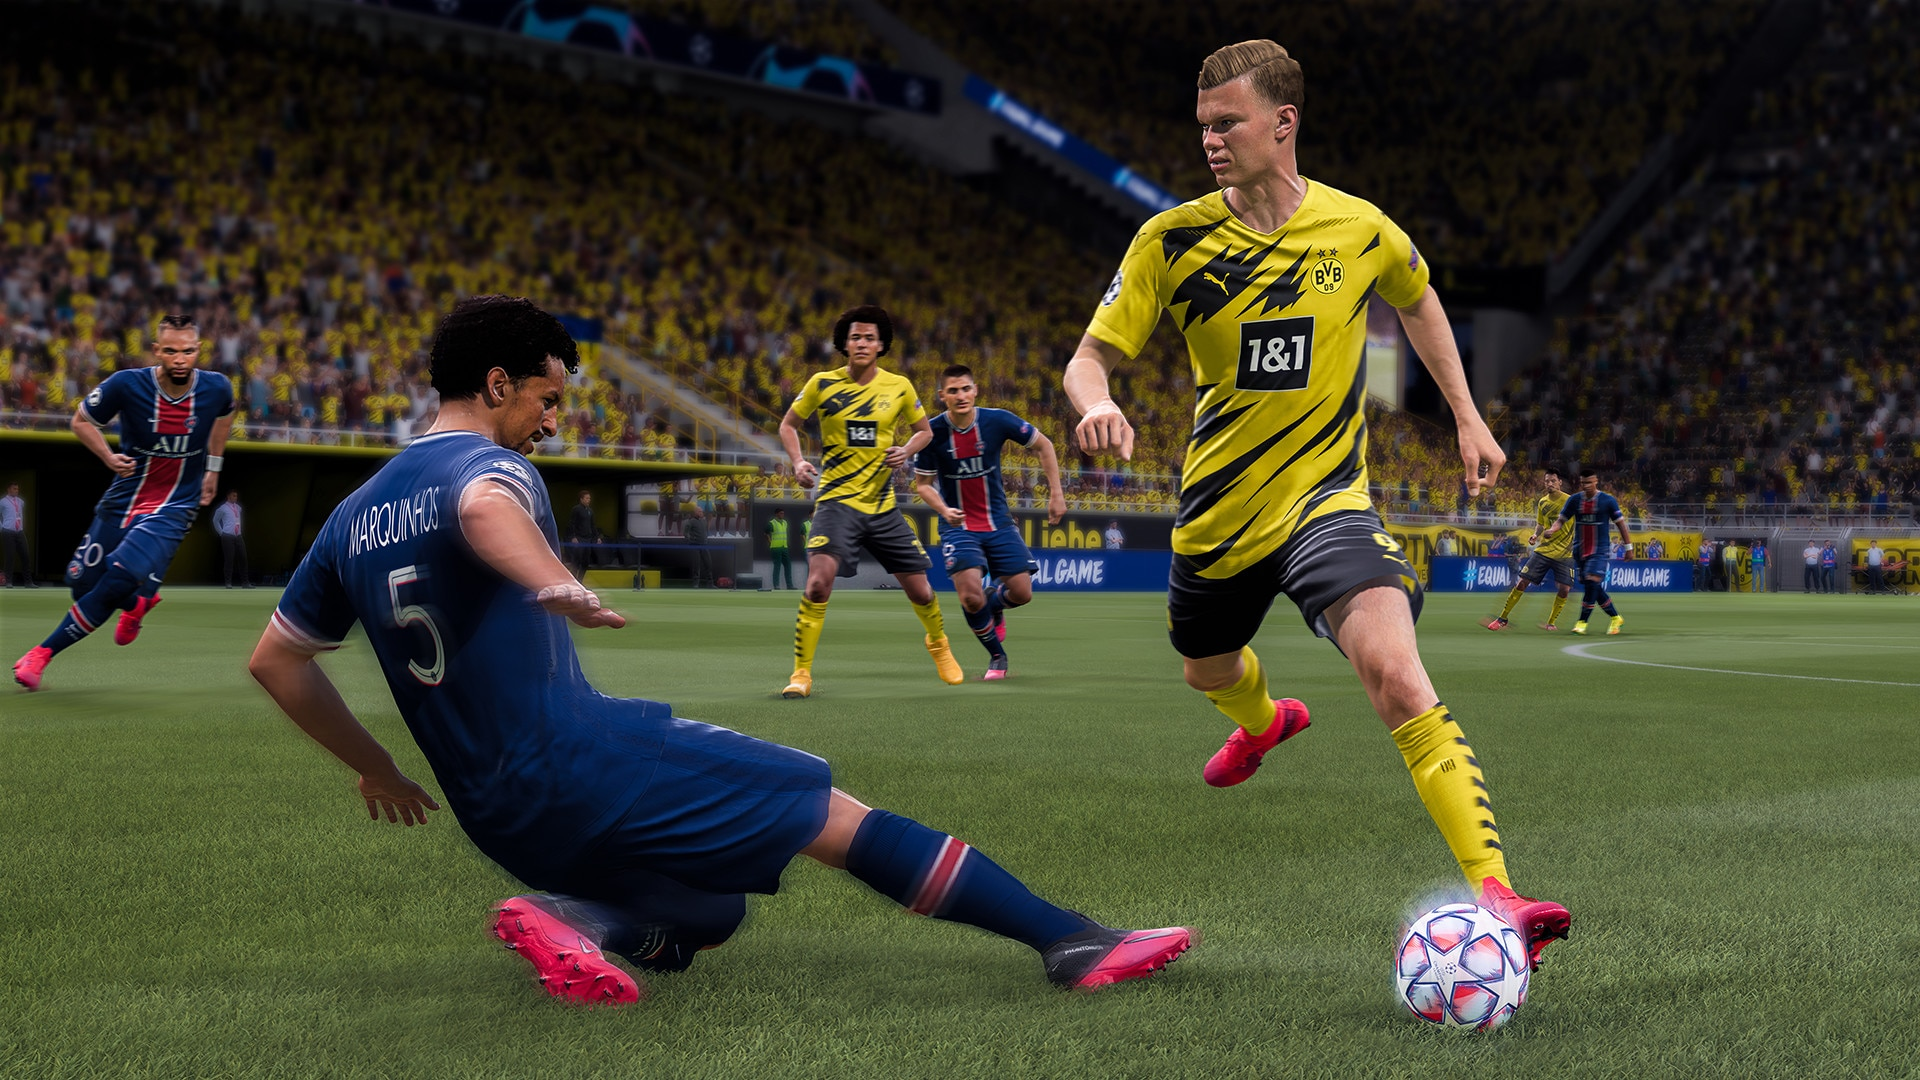 EA SPORTS FIFA 21 (PC) - Origin Key - GLOBAL (EN/PL/CZ/TR/RU) - 3